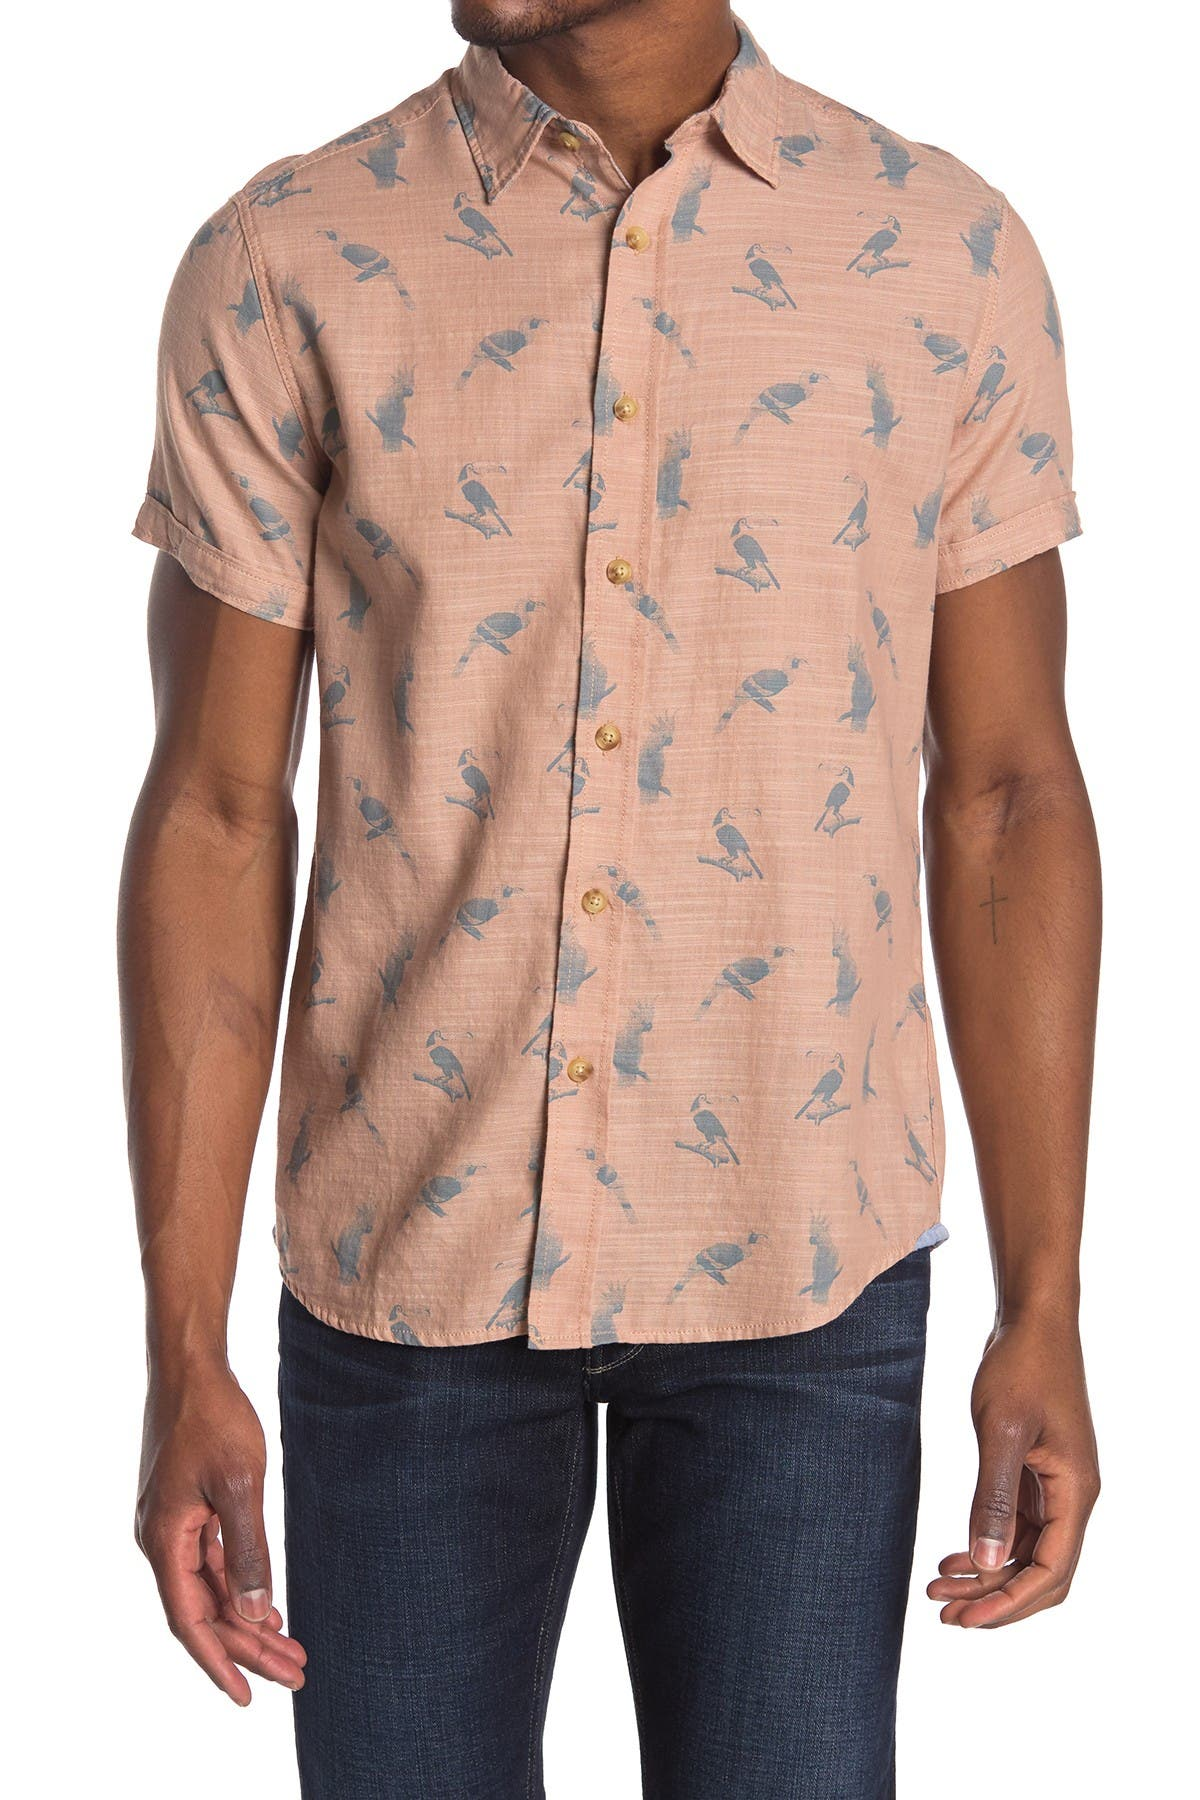 Image of Grayers Toucan Printed Trim Fit Shirt